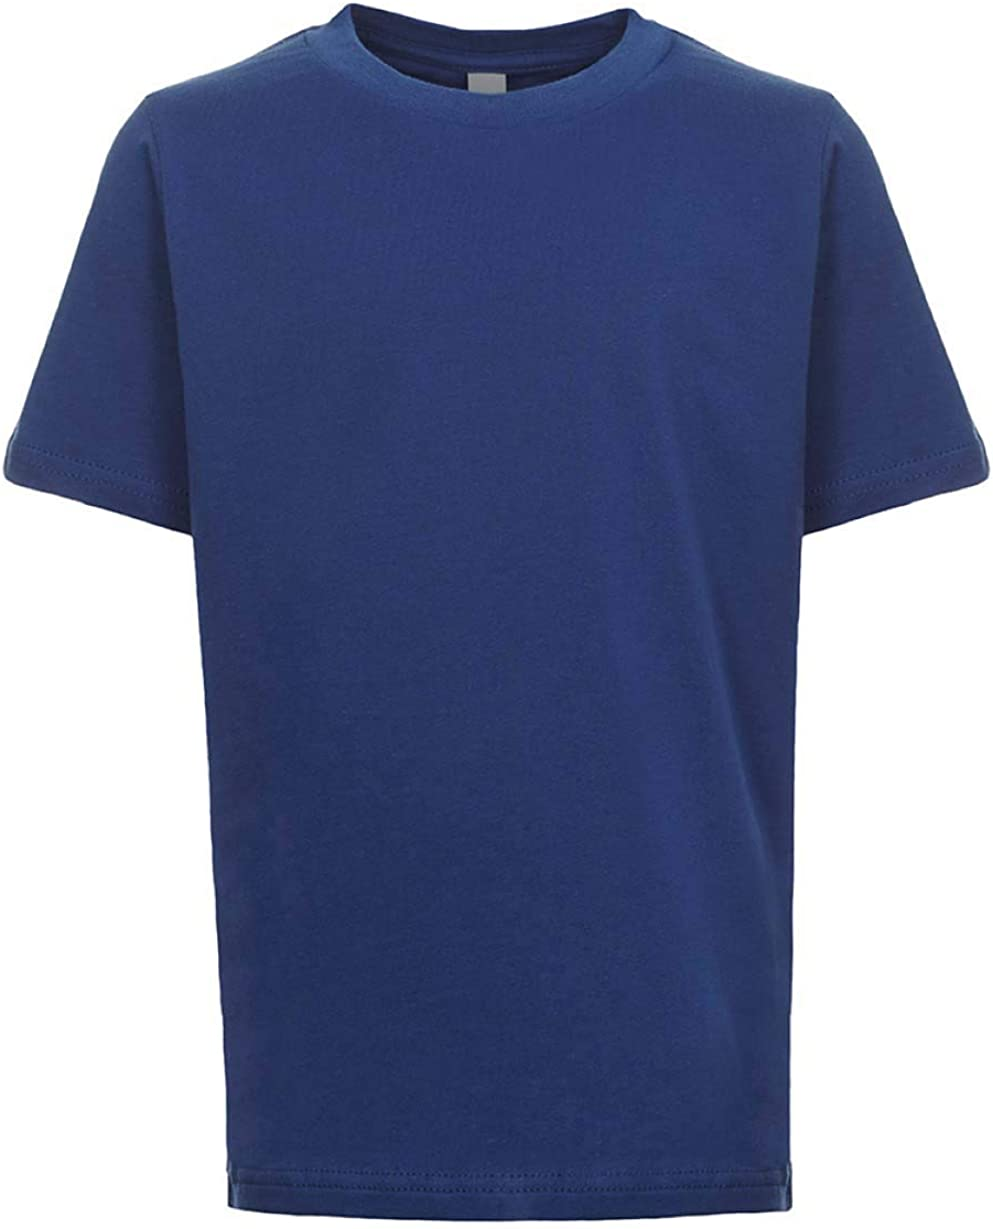 Next Level Kids Crew Neck T-Shirt Royal Blue XL